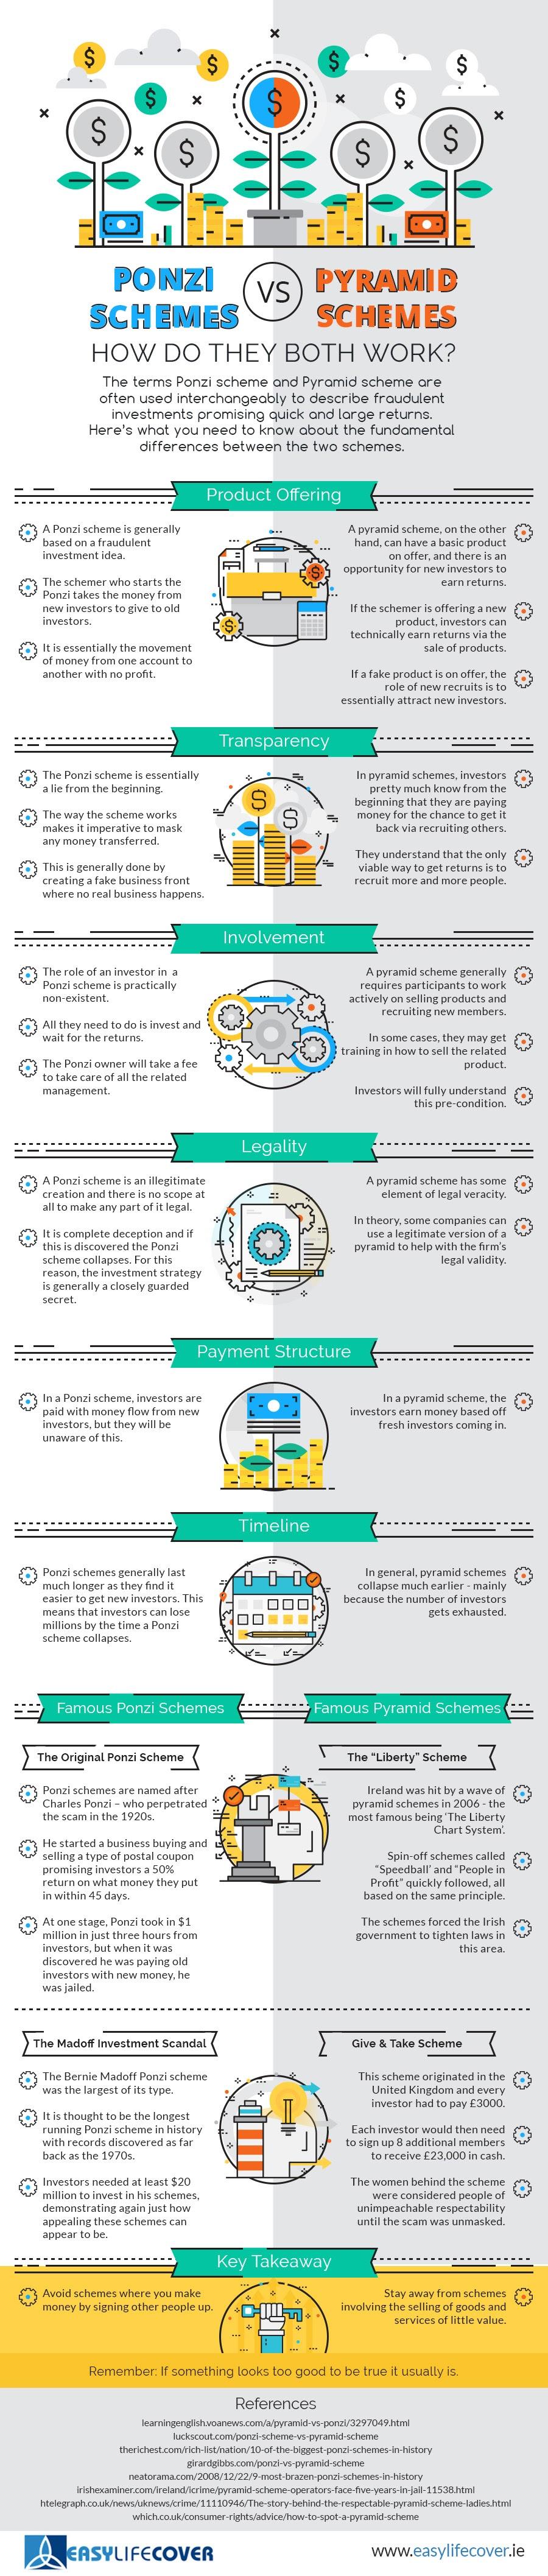 ponzi-schemes-vs-pyramid-schemes-how-do-they-both-work-infographic